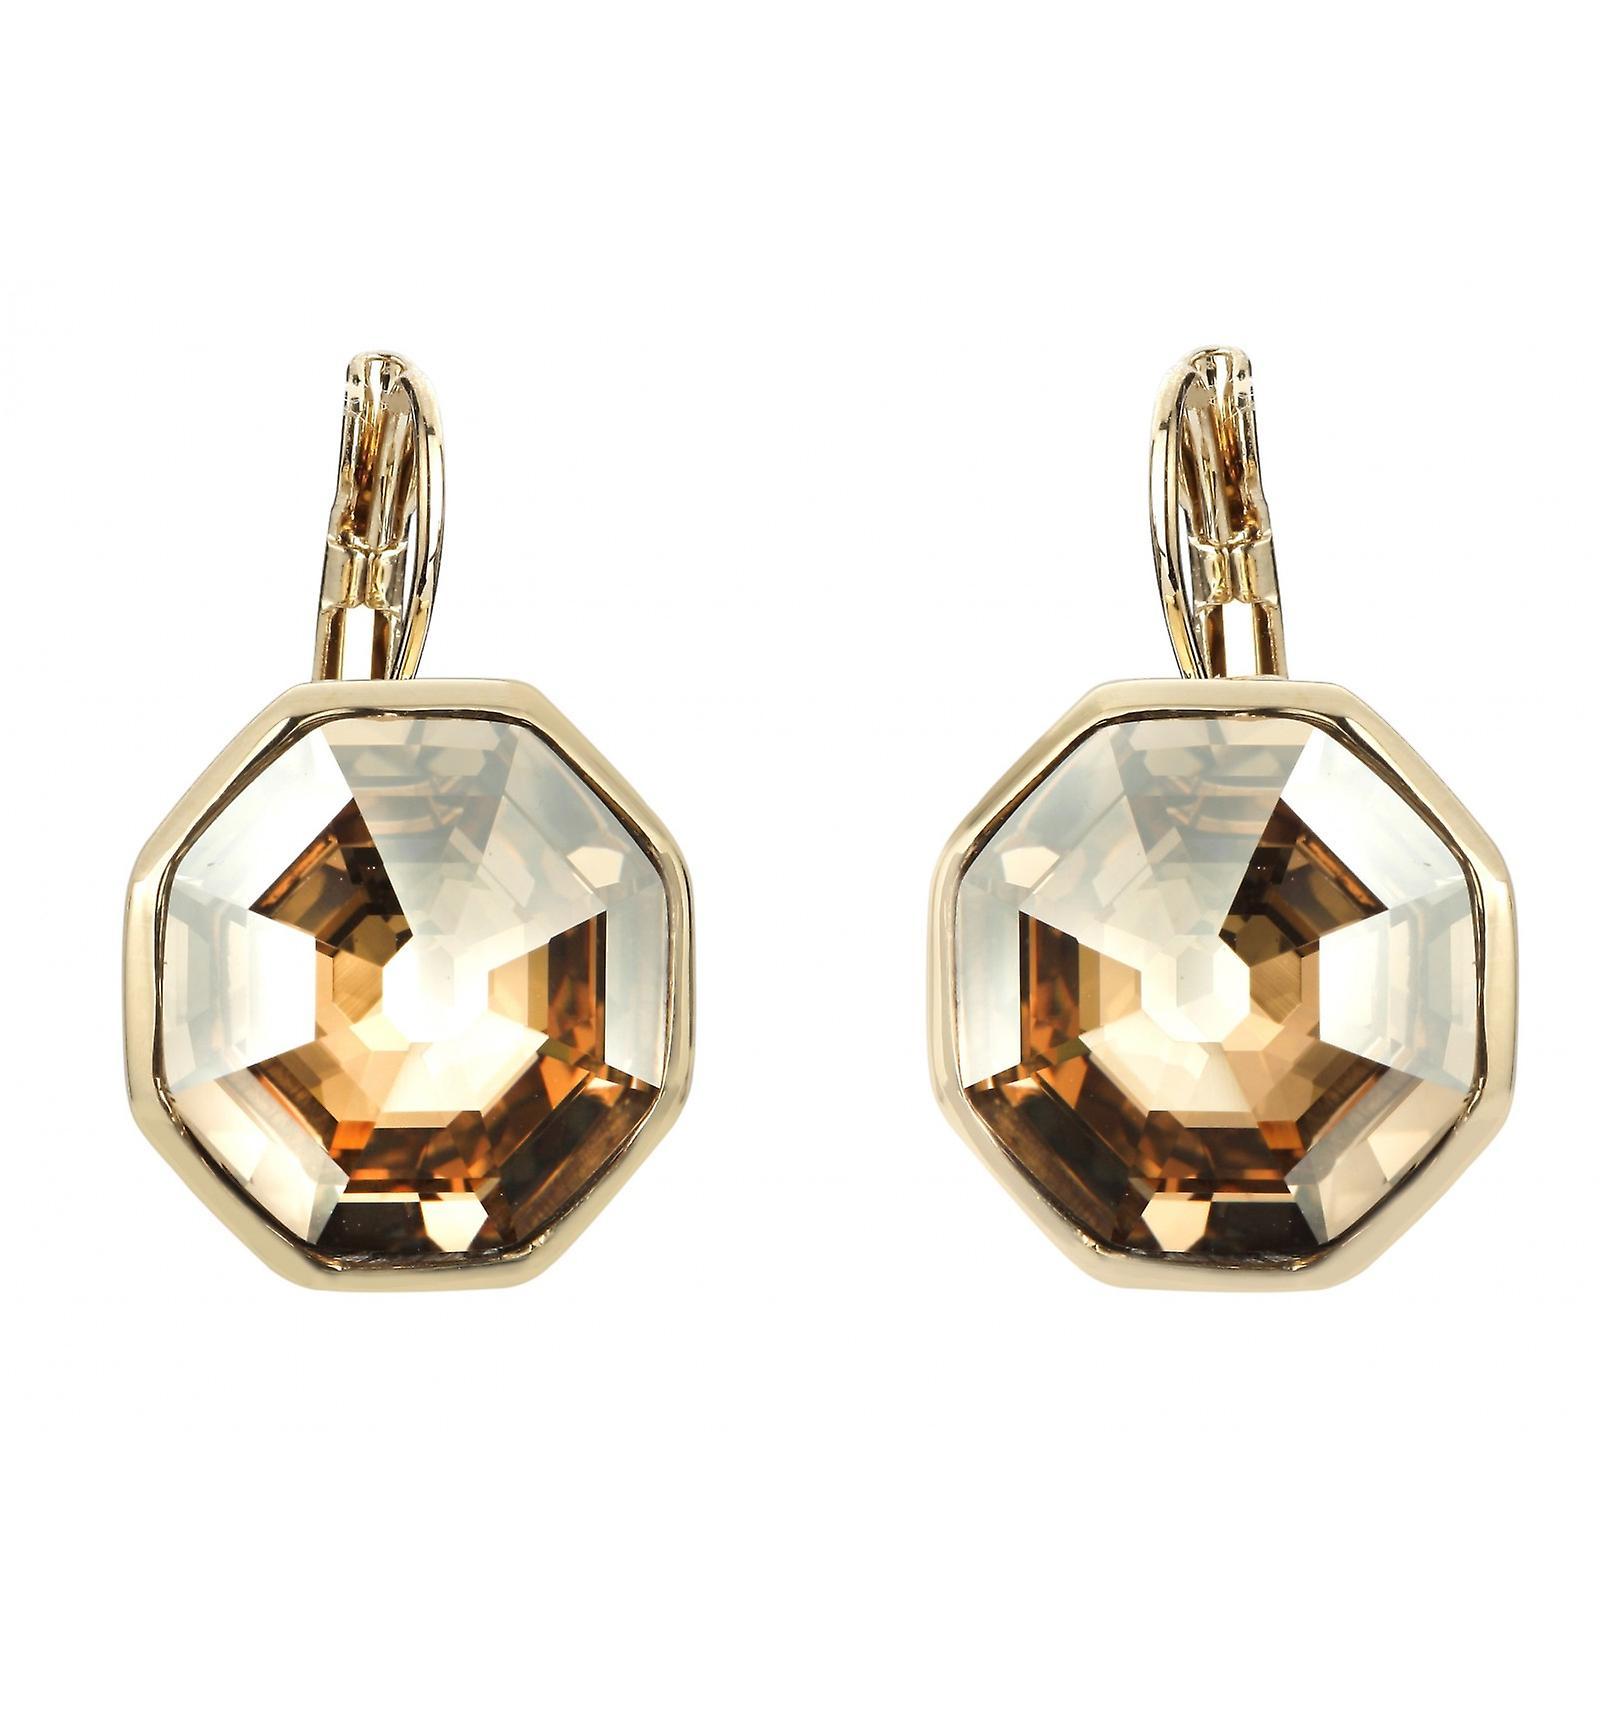 Traveller drop earring - Hexagon - 22ct gold palted - 156960